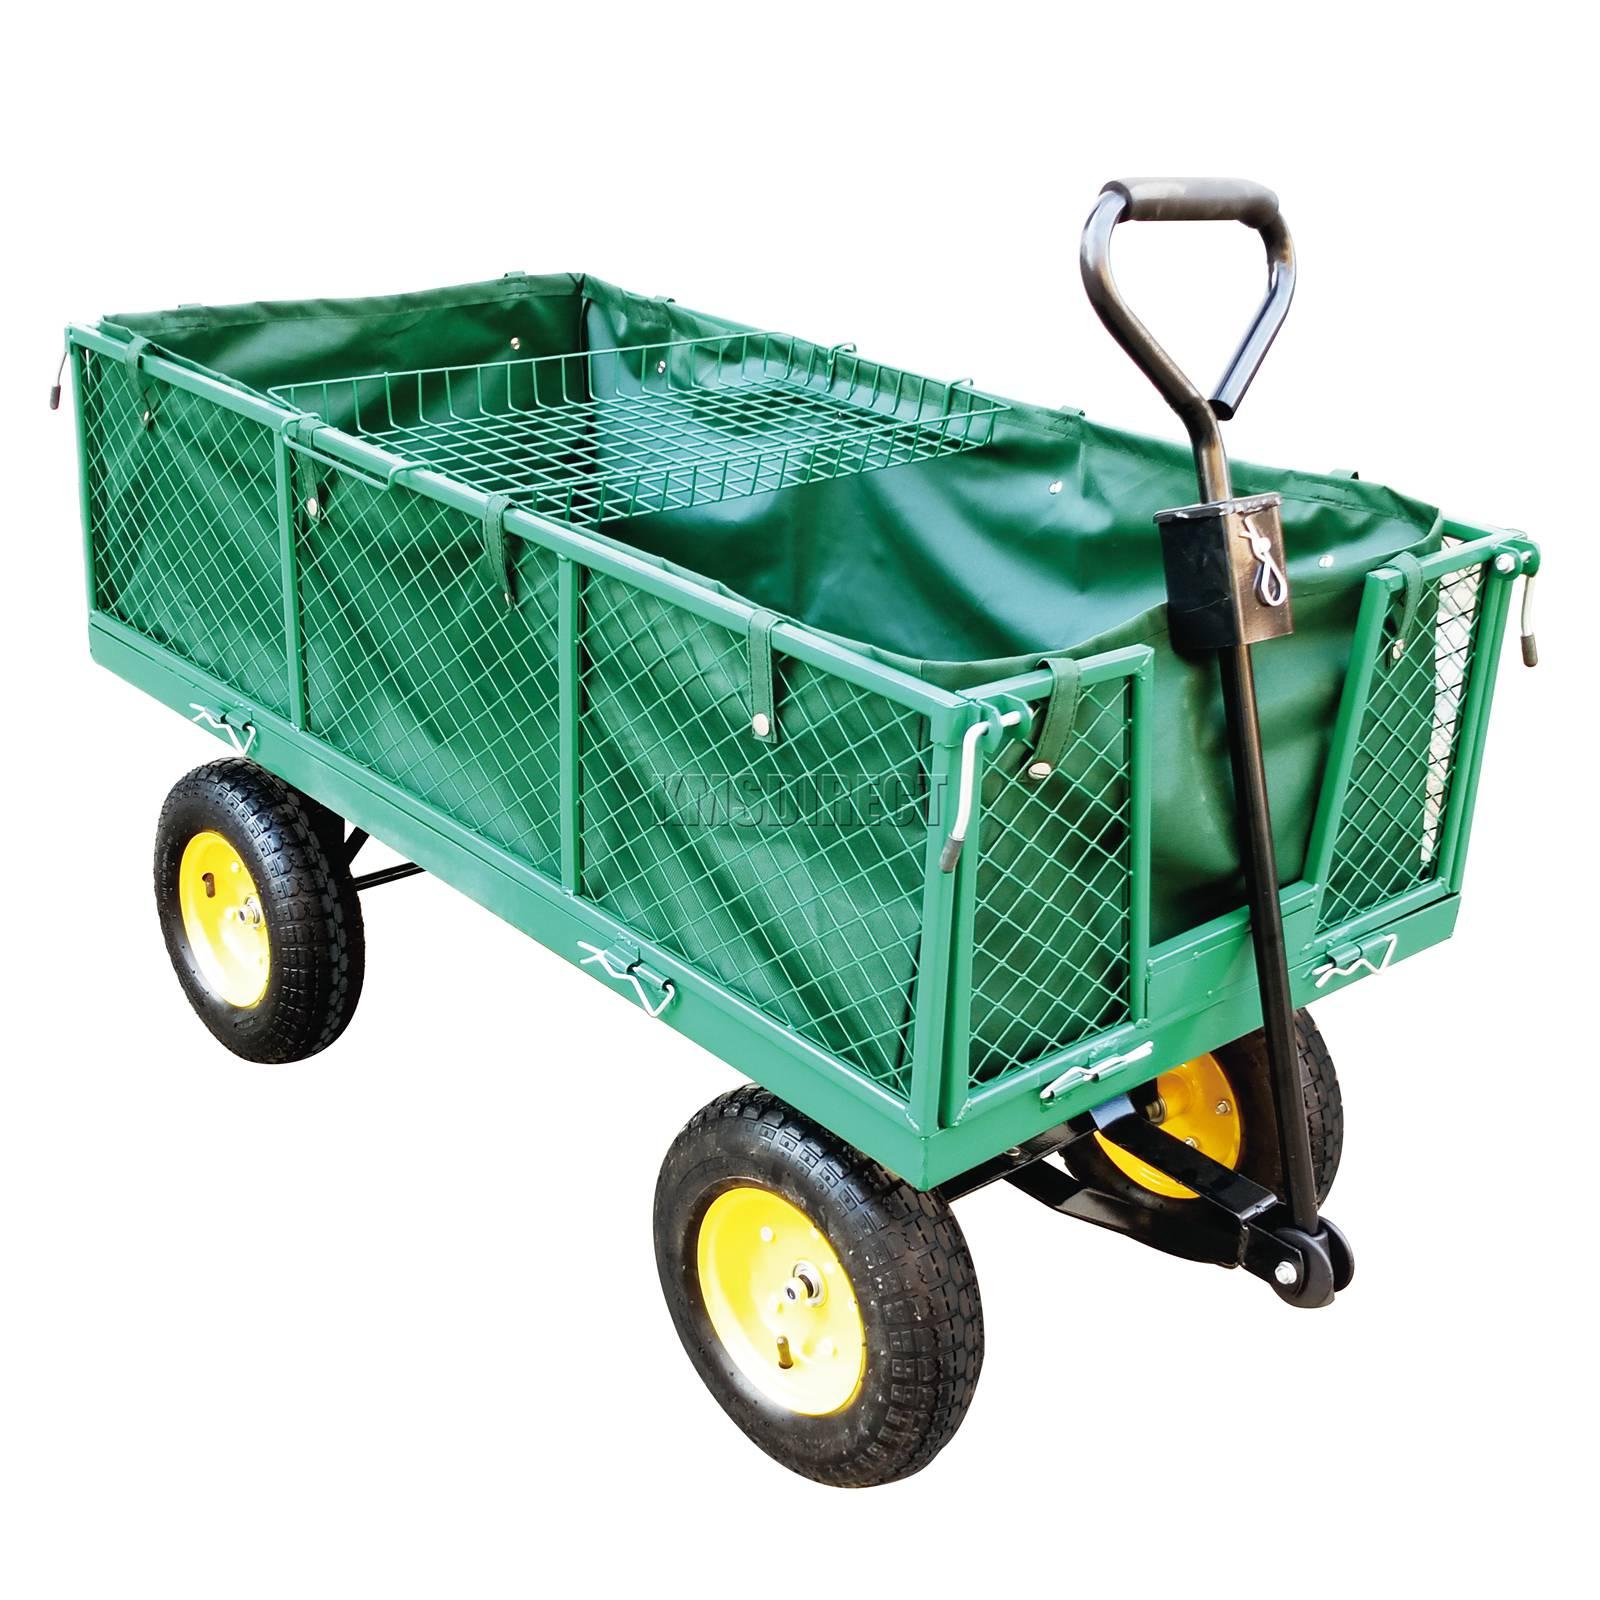 FoxHunter-Heavy-Duty-Garden-Dump-Truck-Tipping-Trailer-Trolley-Cart-Wheelbarrow miniatuur 23